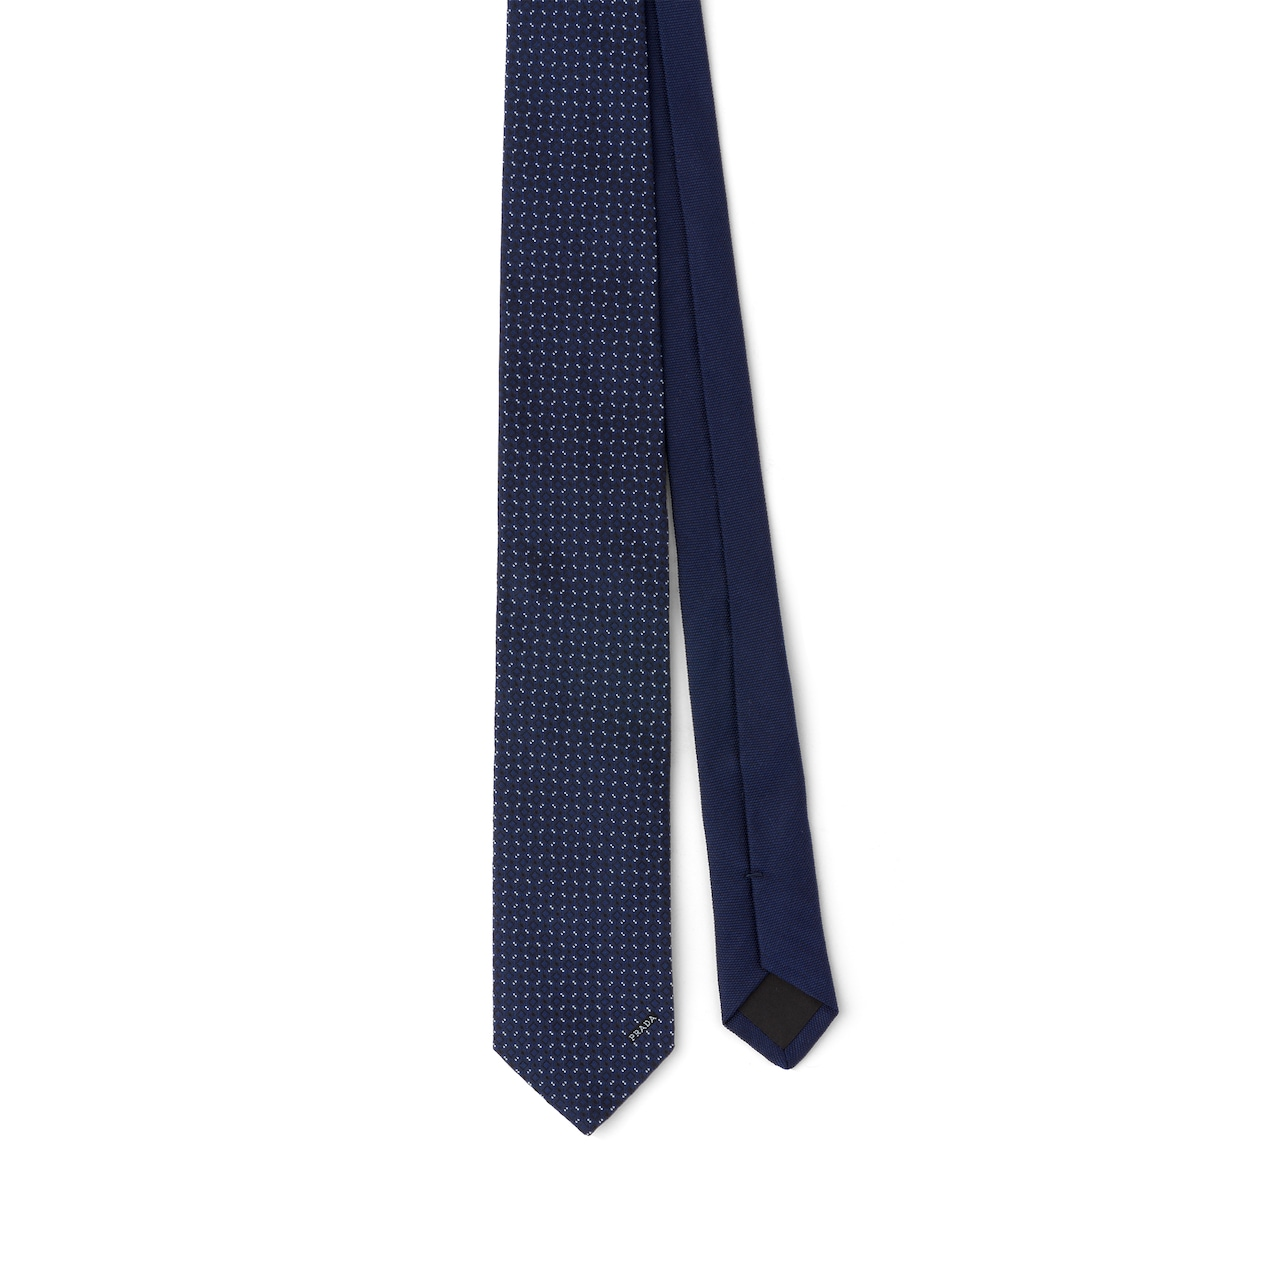 Prada 丝质斜纹领带 1